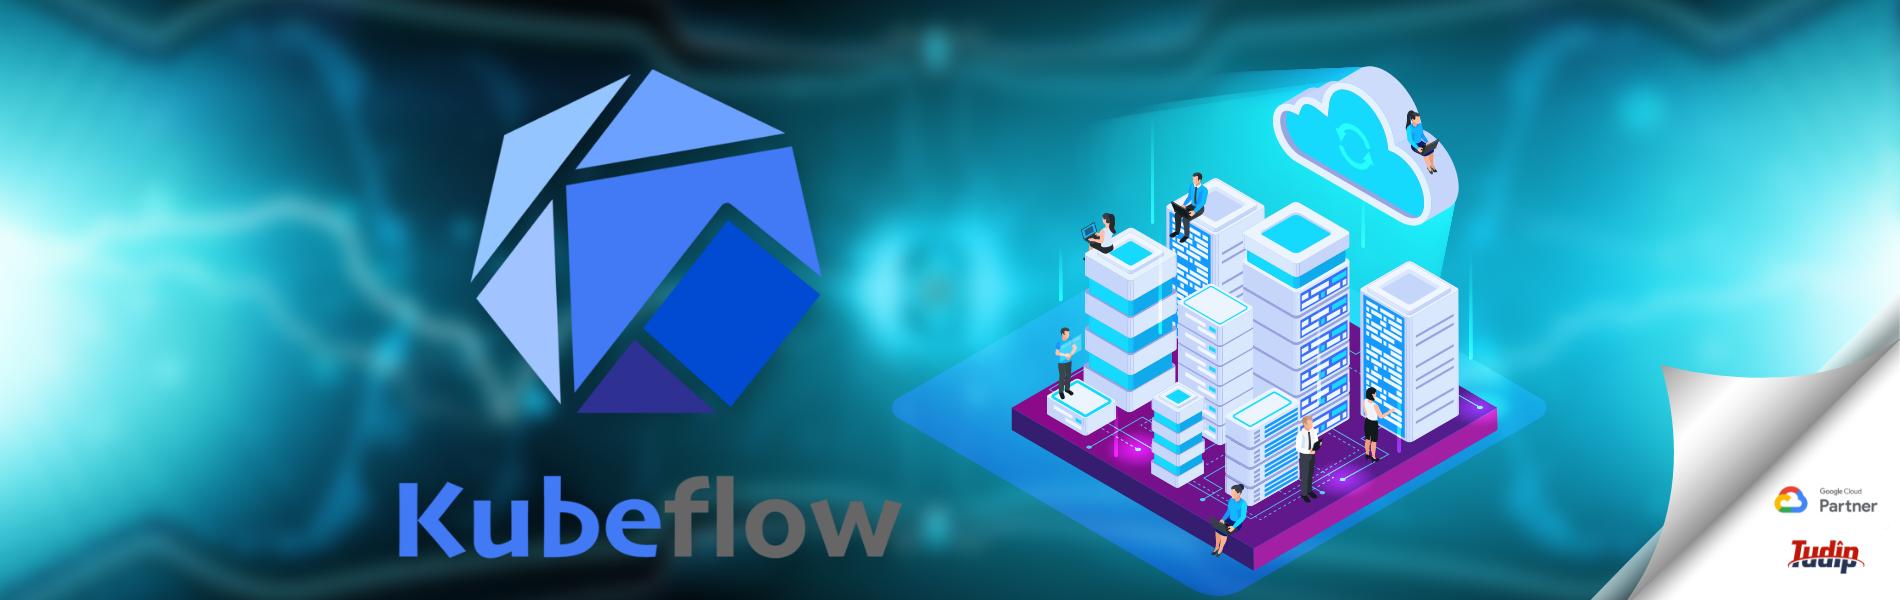 kubeflow_pipelines_Changed_Website